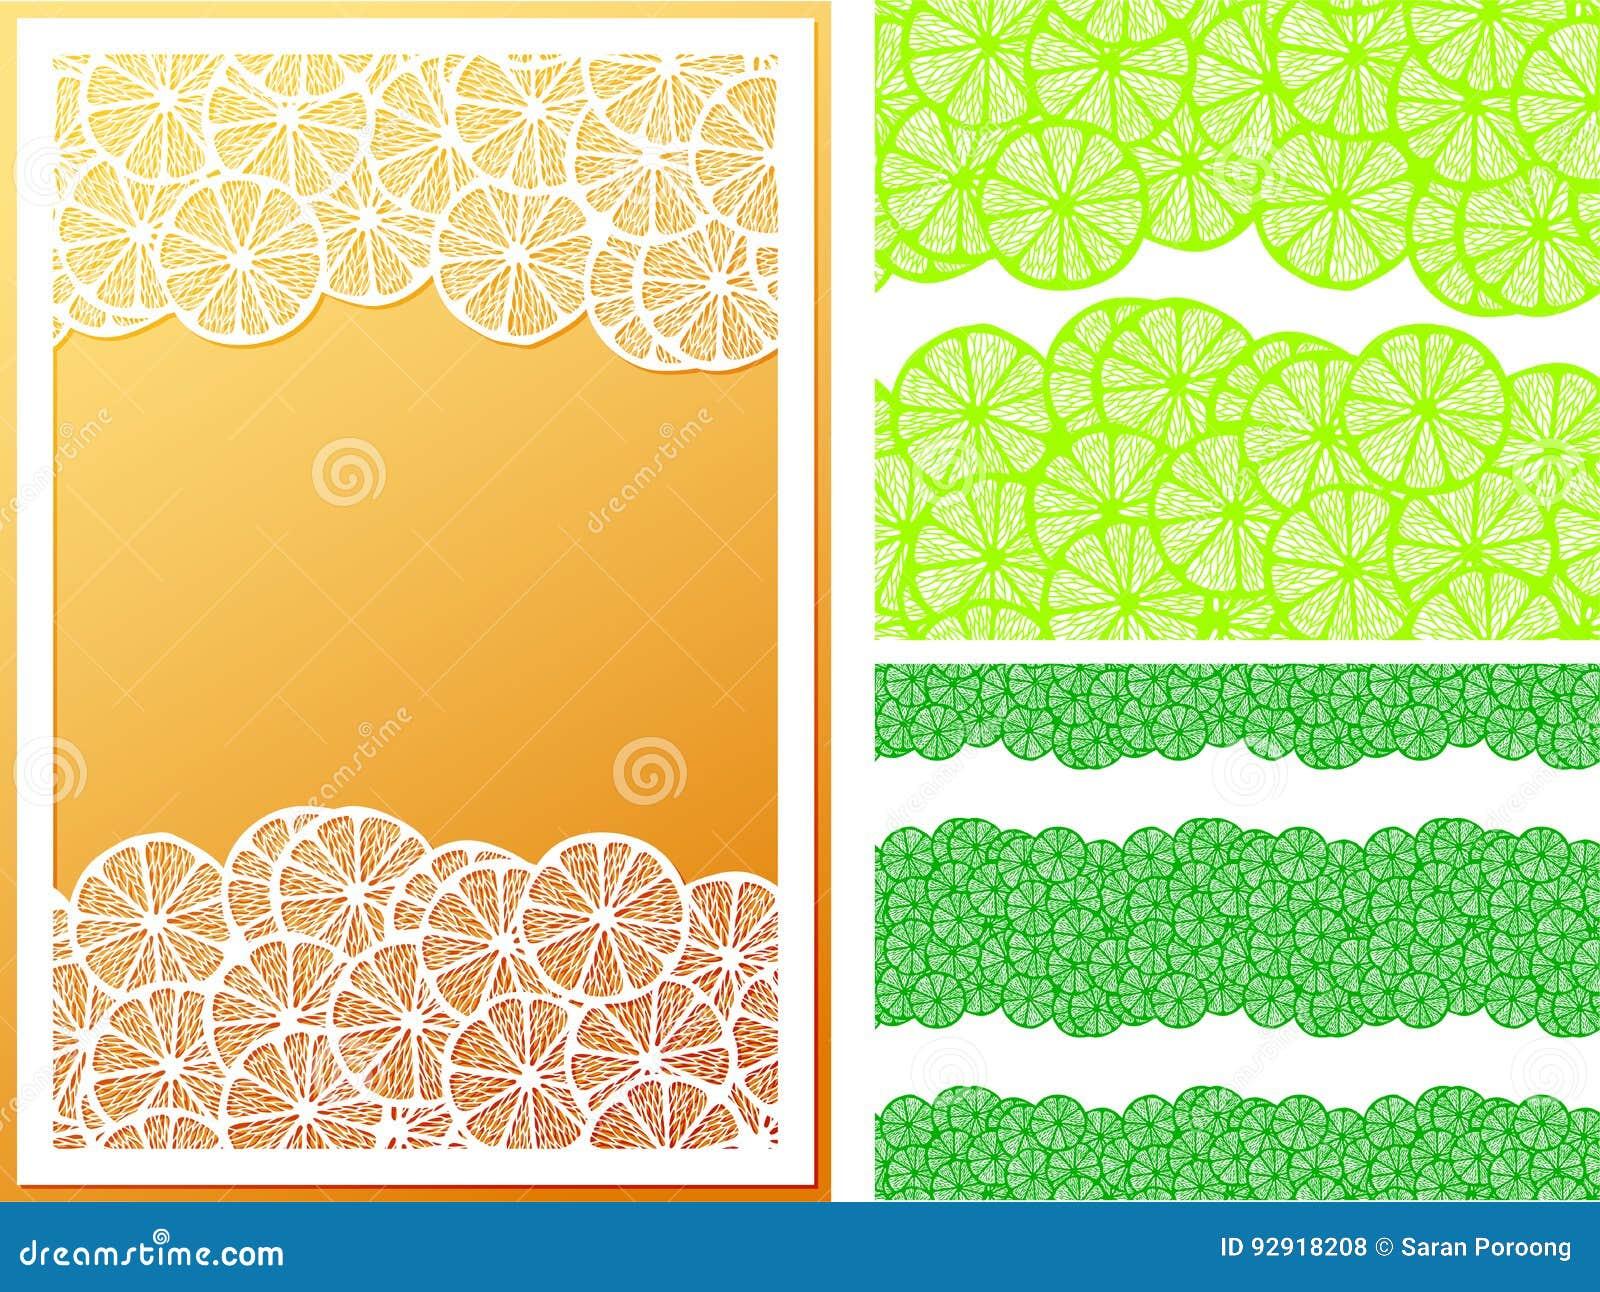 Horizontal seamless lemon slices pattern and frame